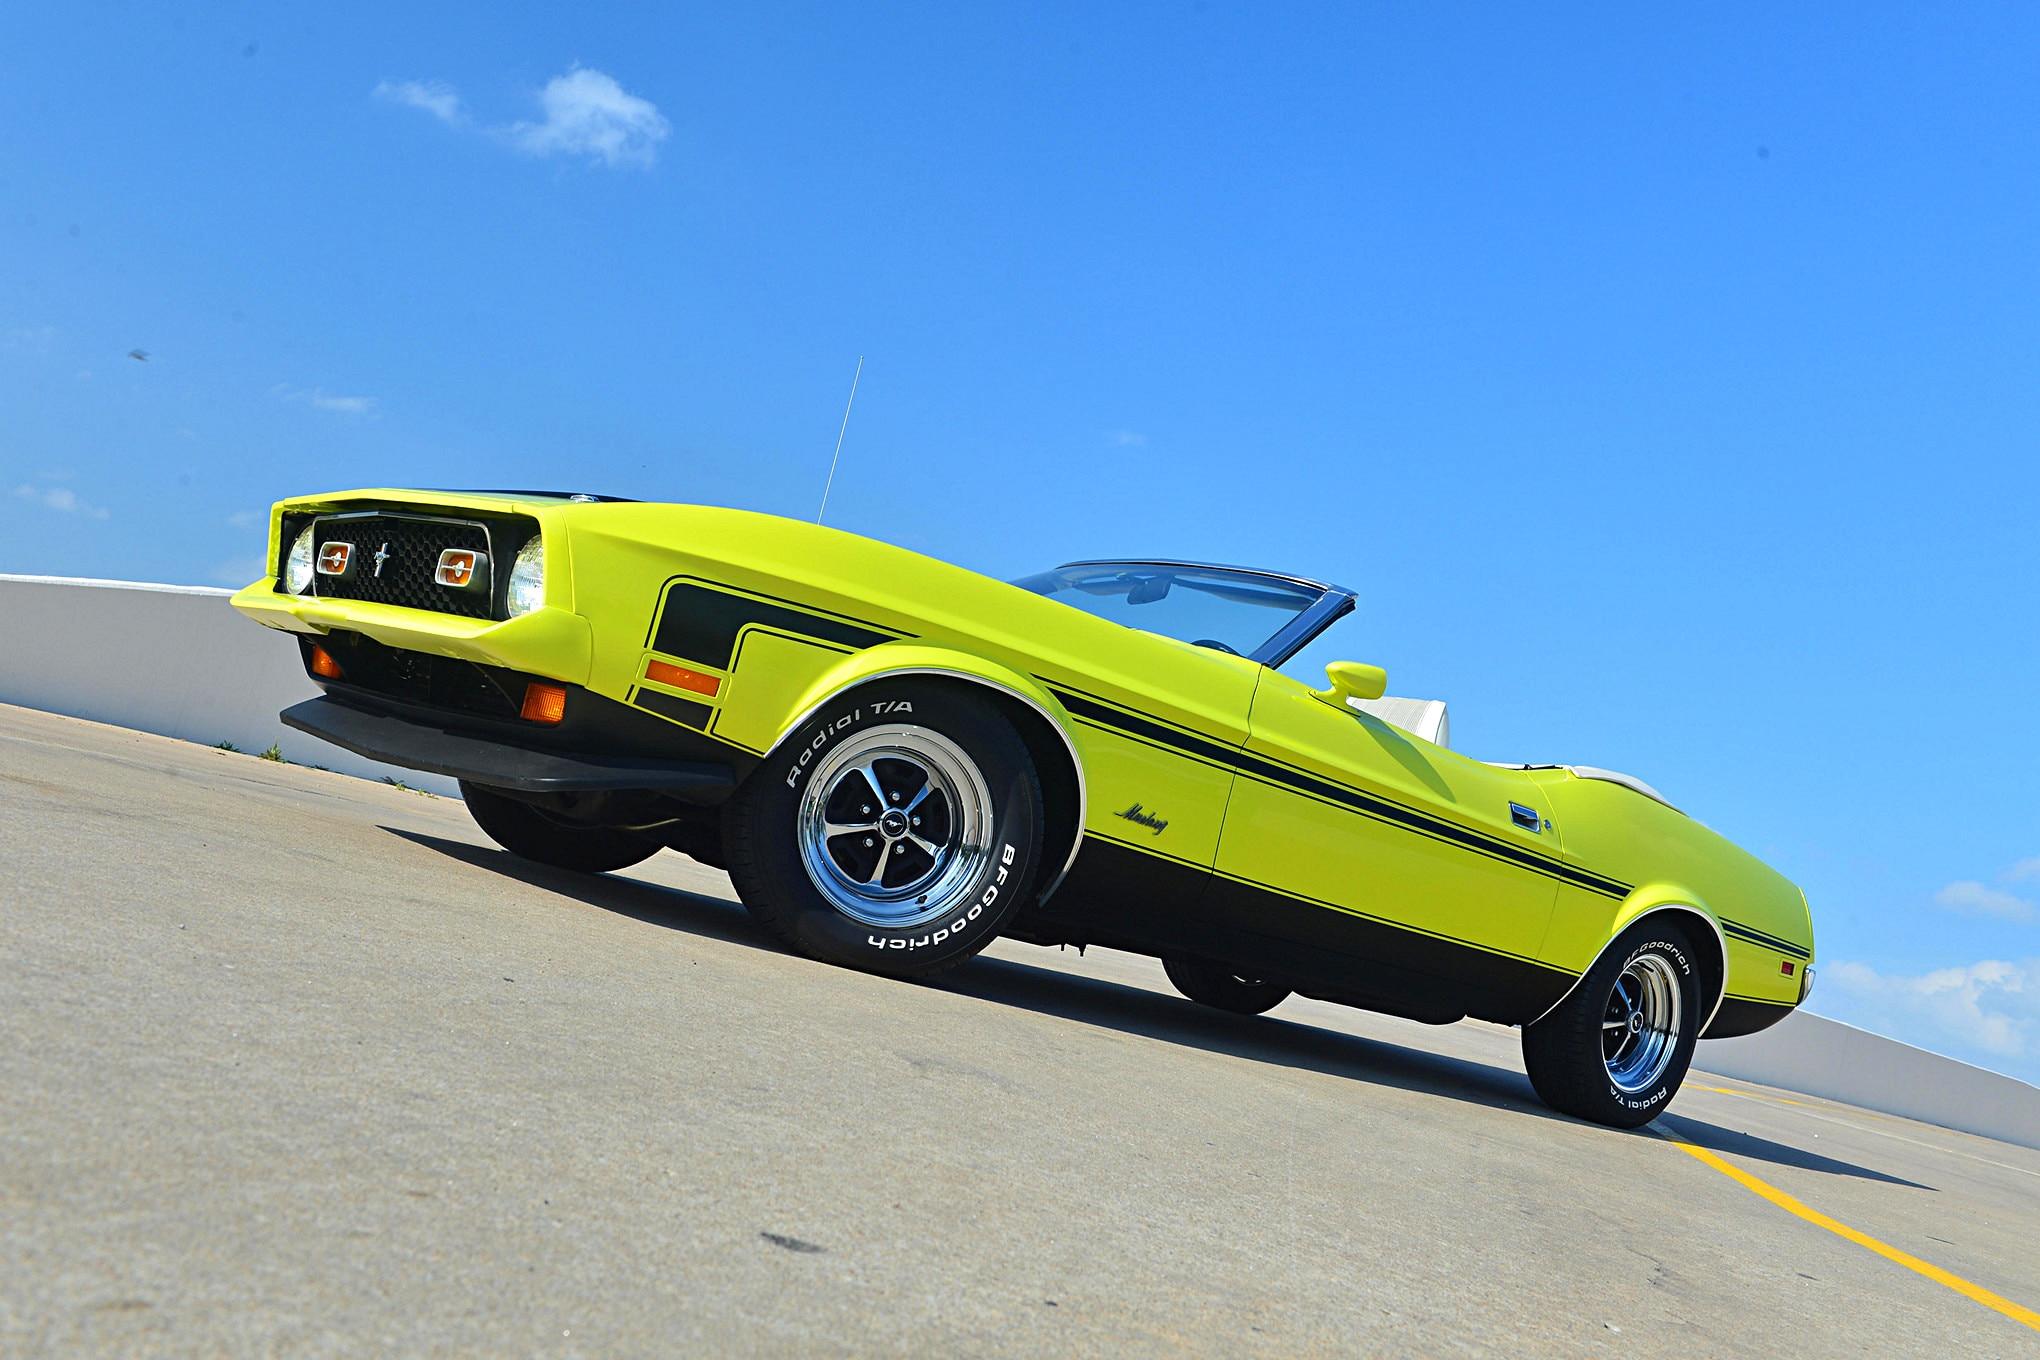 024 1971 73 Mustang SpottersGuide Heasley